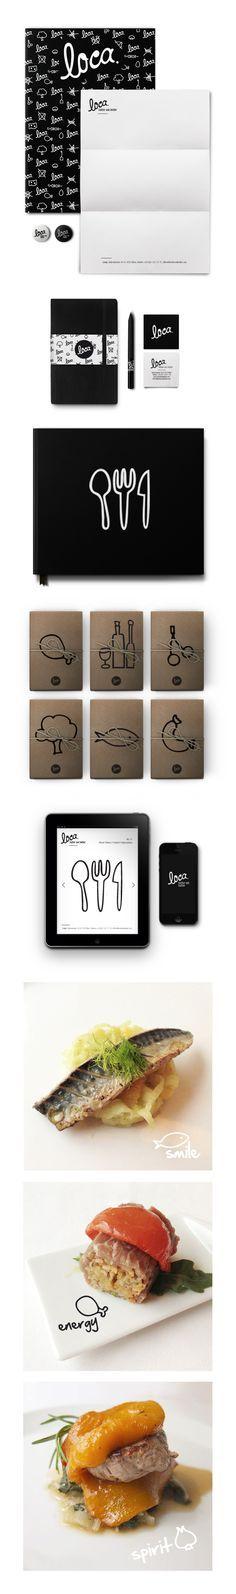 Loca | #logo #stationary #corporate #design #corporatedesign #identity #branding #packaging